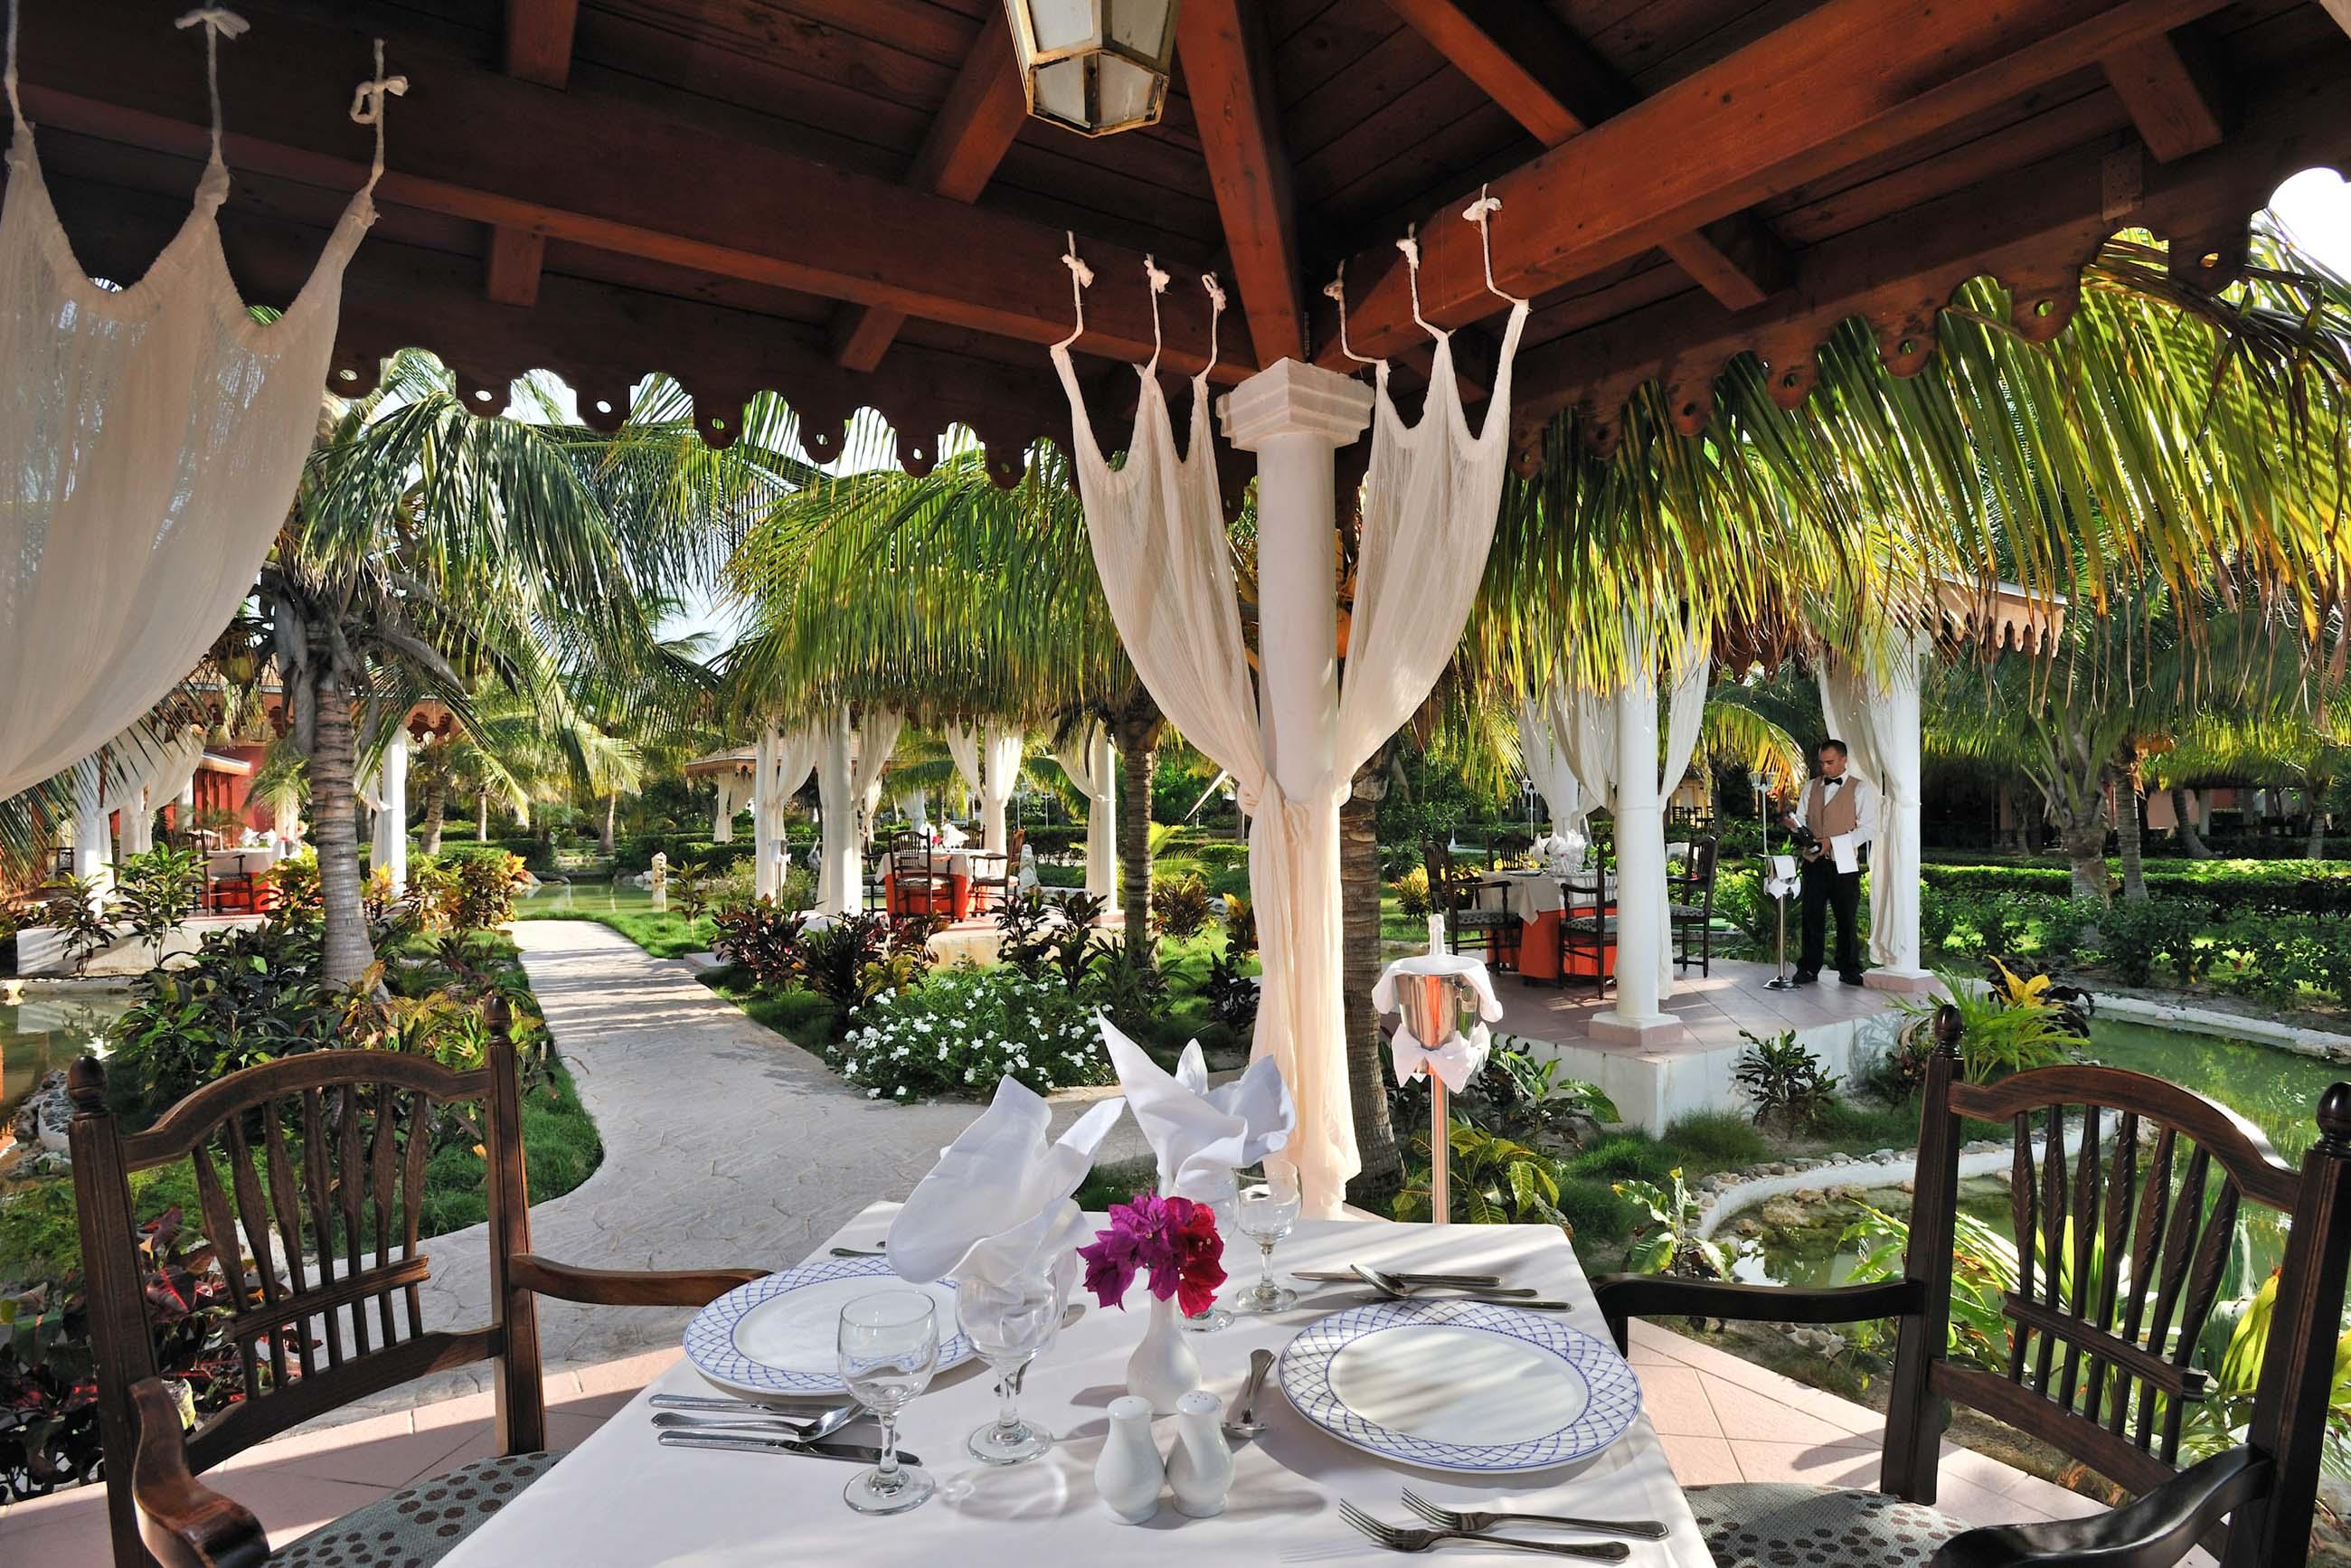 https://bubo.sk/uploads/galleries/5009/308amelialasdunas-palapas_romanticas_restaurant.jpg